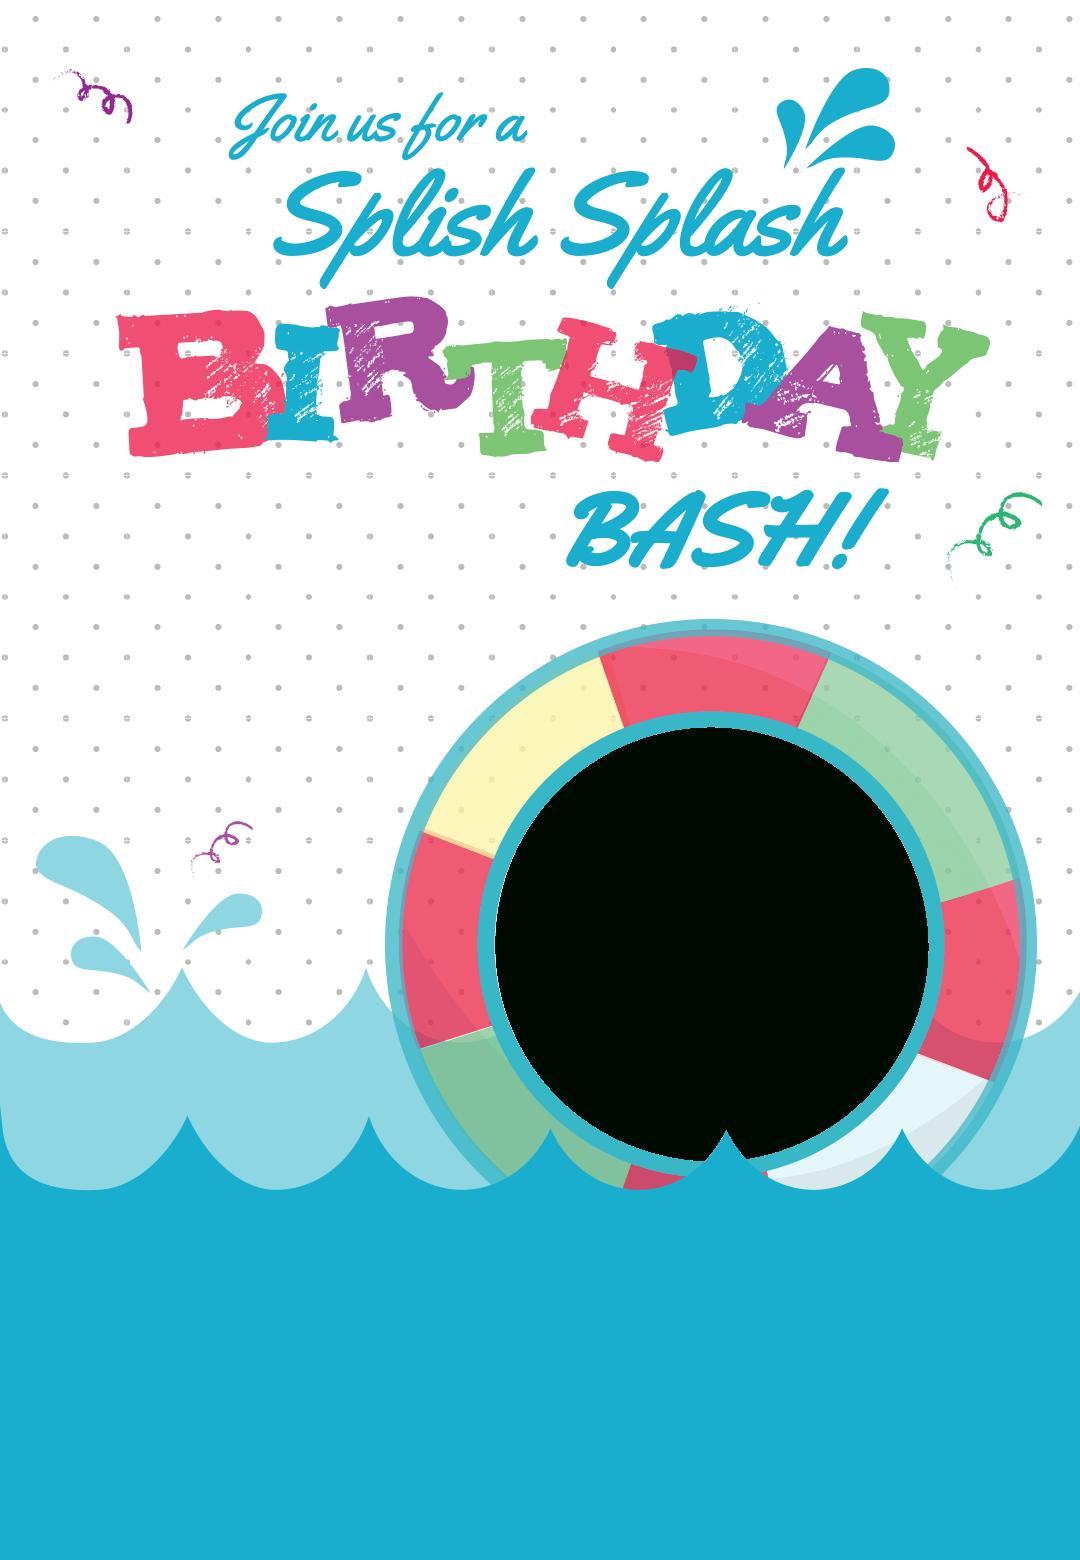 Splish Splash - Free Printable Summer Party Invitation Template - Free Printable Pool Party Invitations